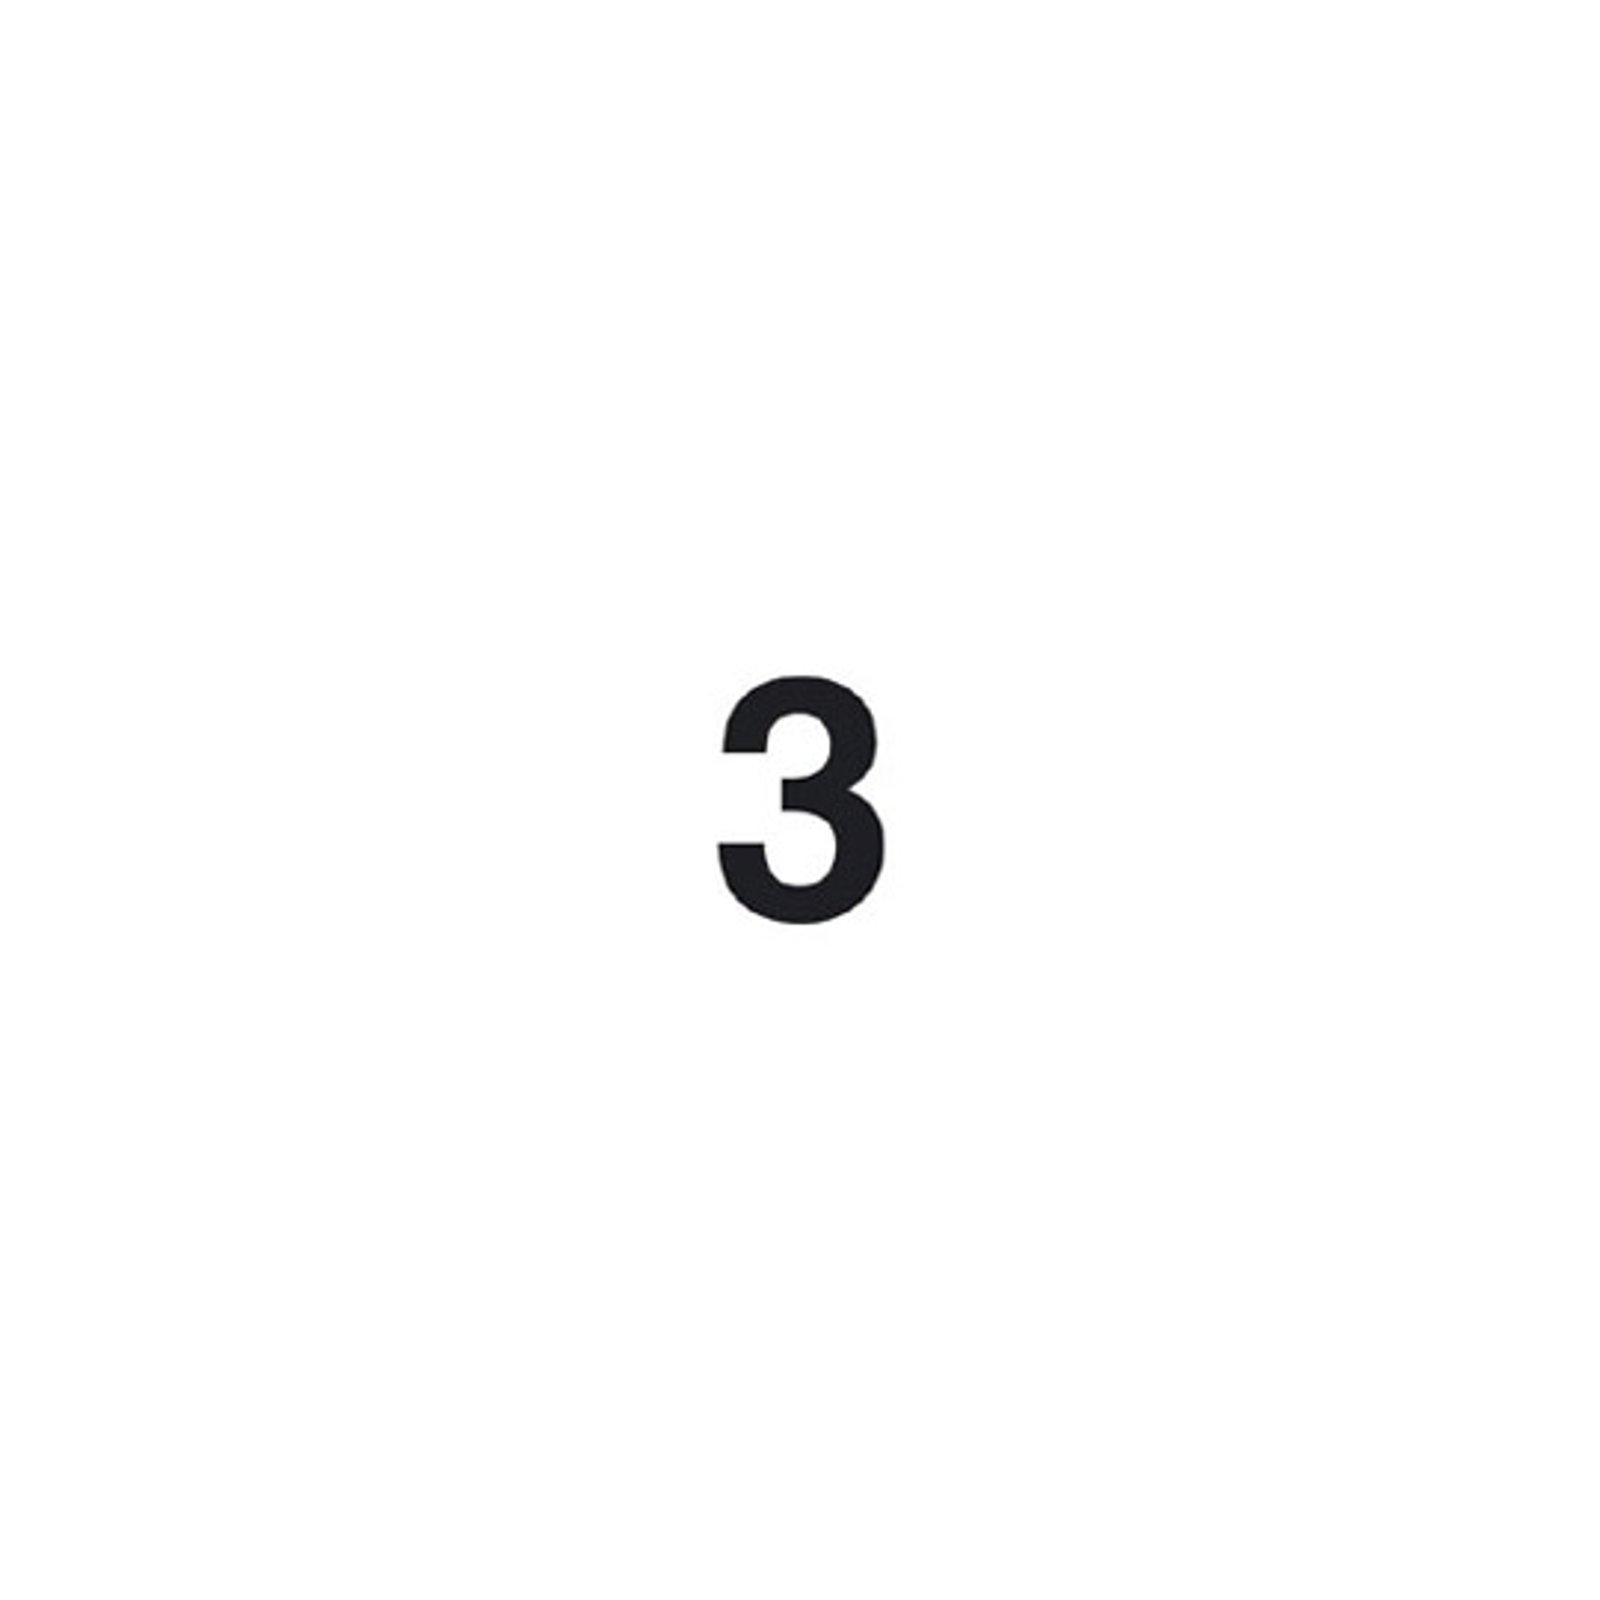 Selvklebende tallet 3